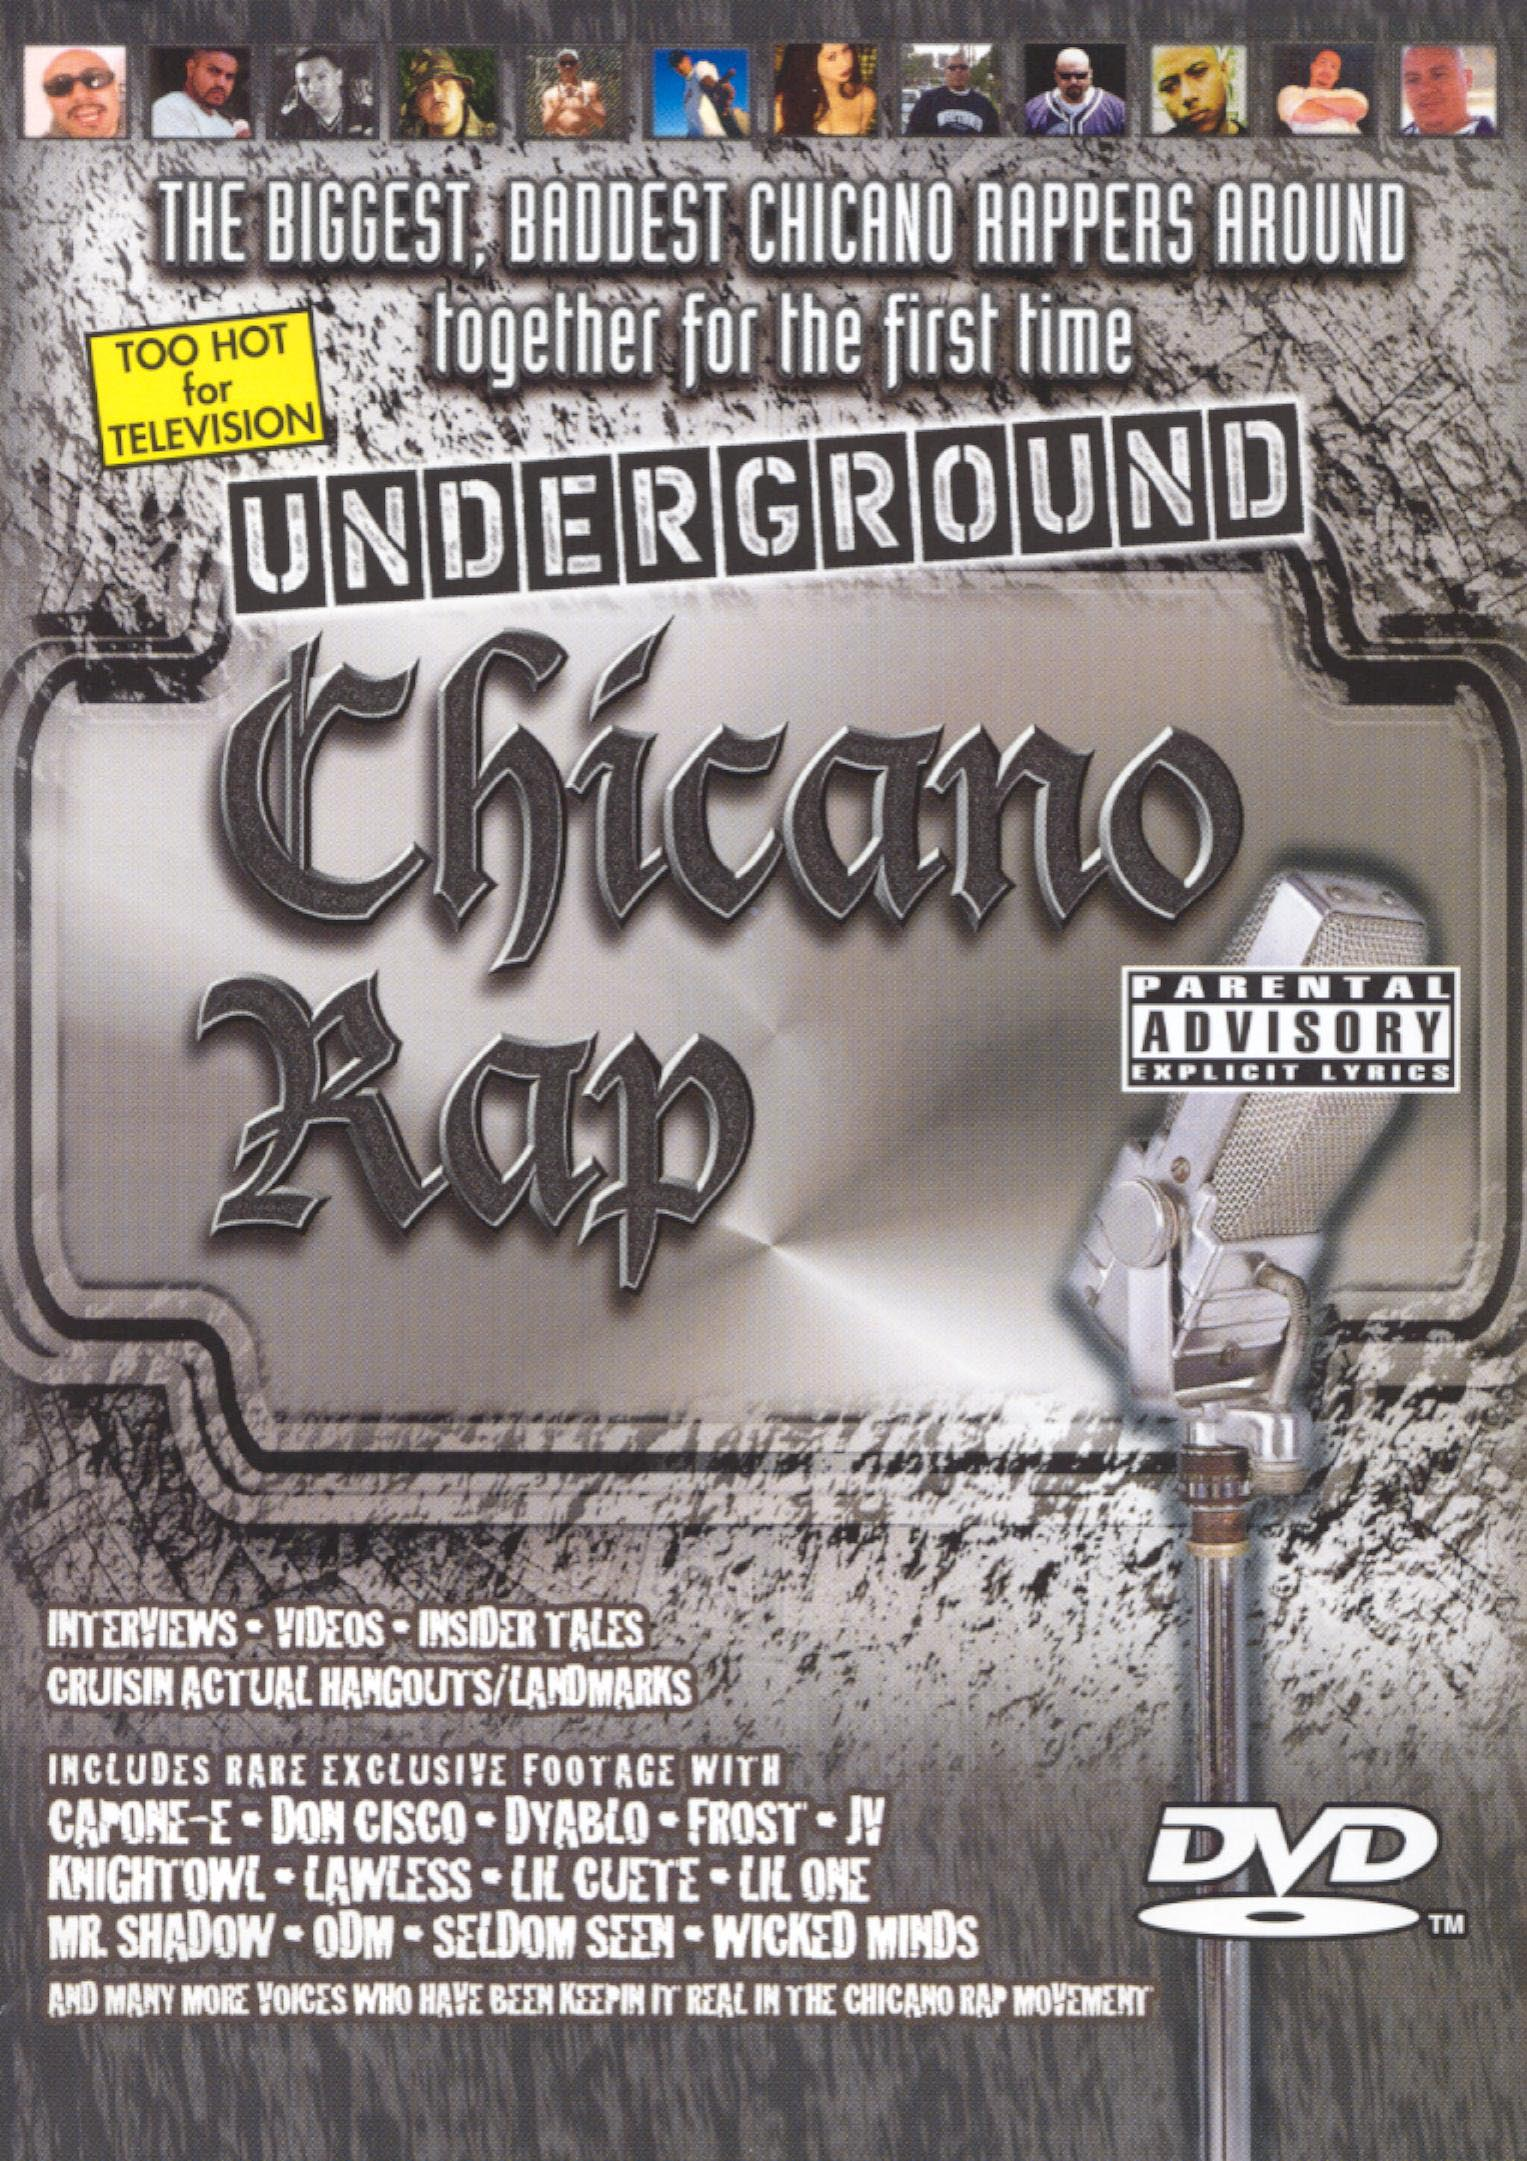 Underground Chicano Rap Show